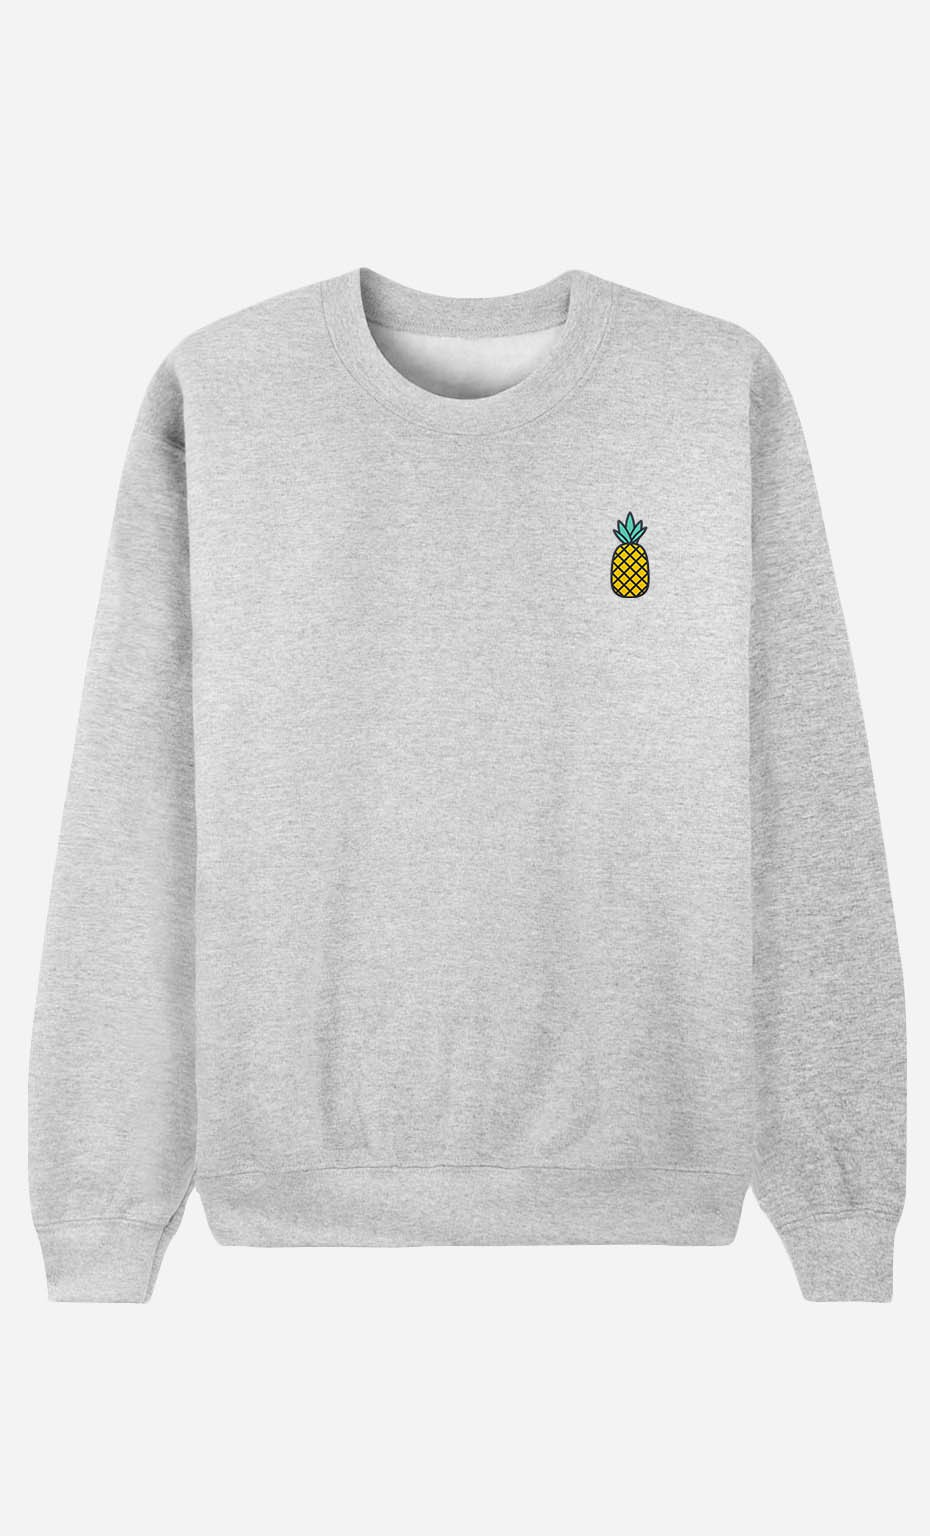 Sweatshirt Pineapple - embroidered